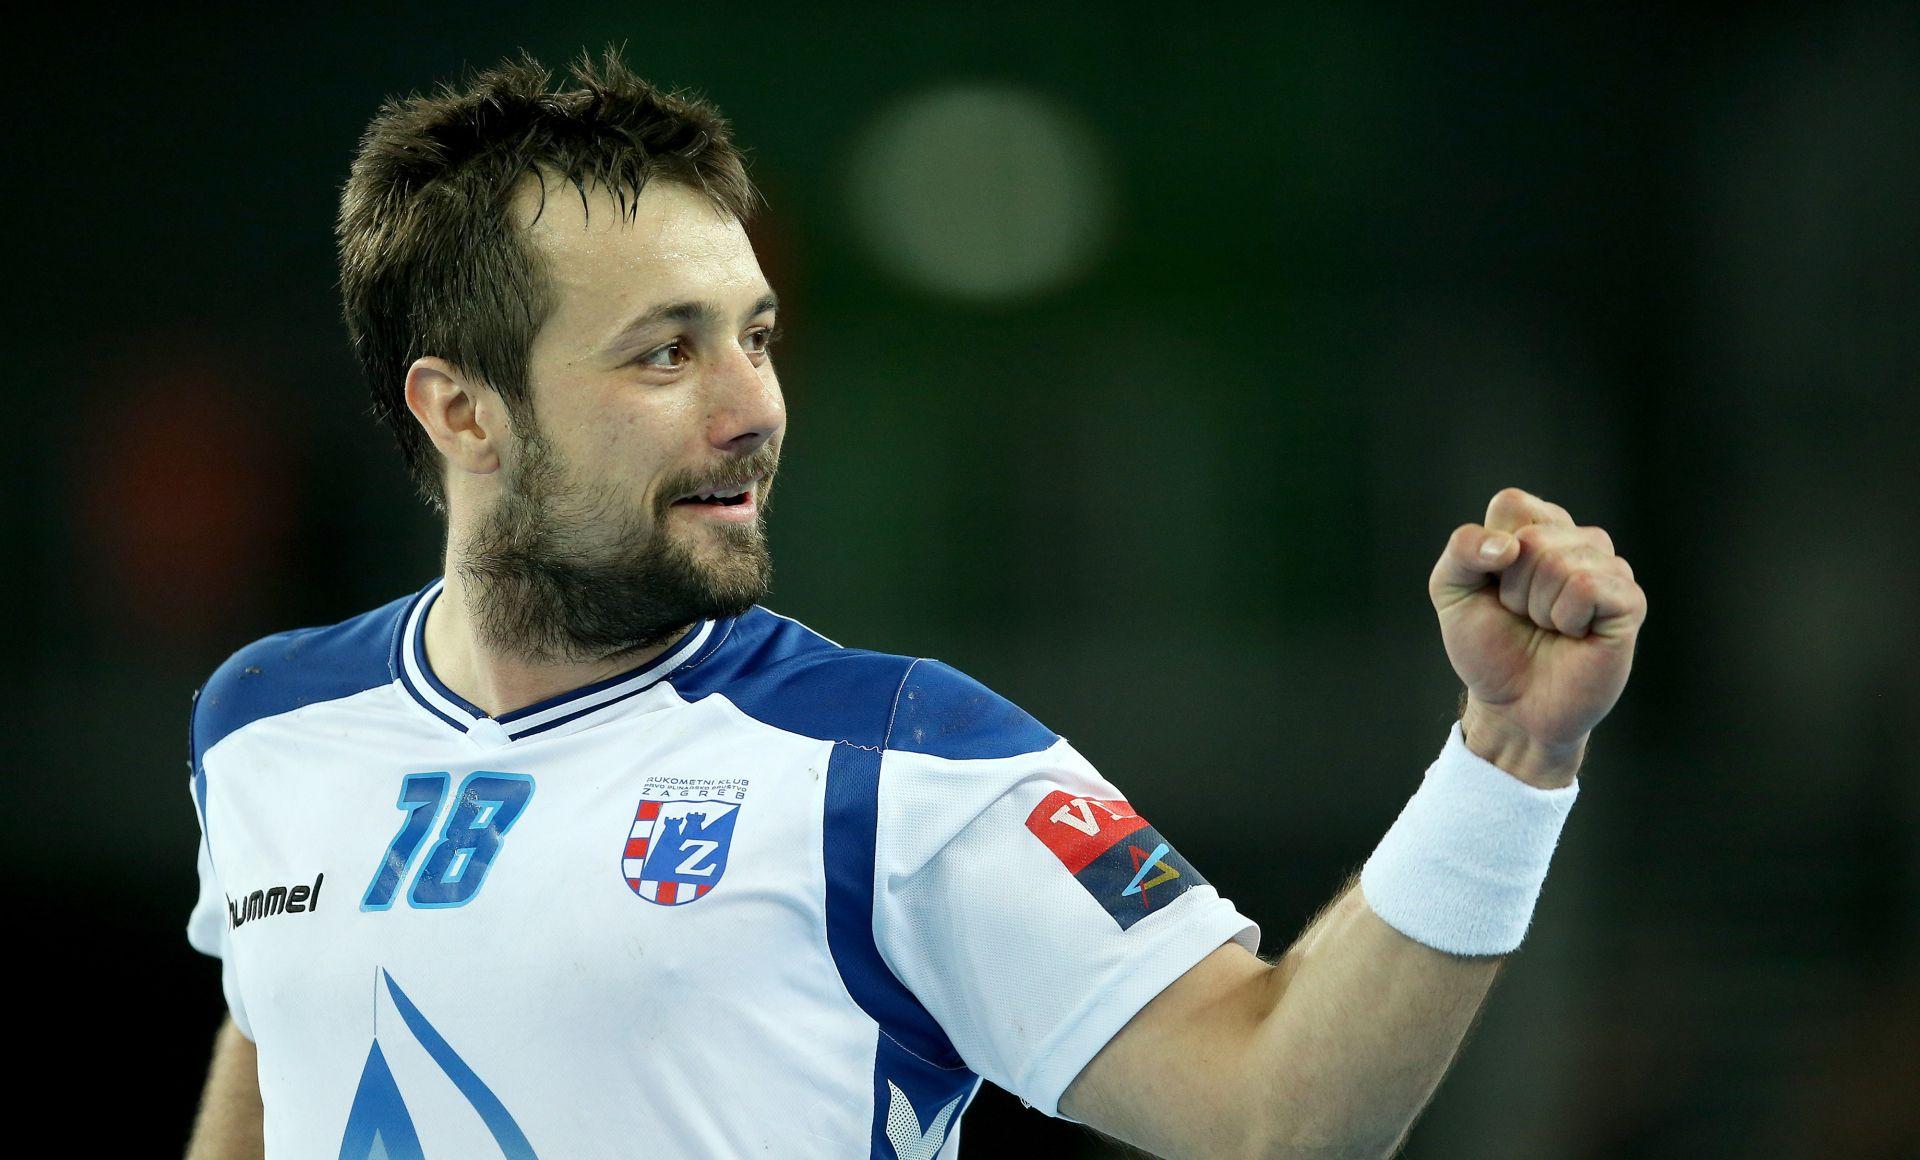 LIGA PRVAKA Pobjeda Vardara odvela PPD Zagreb u osminu finala